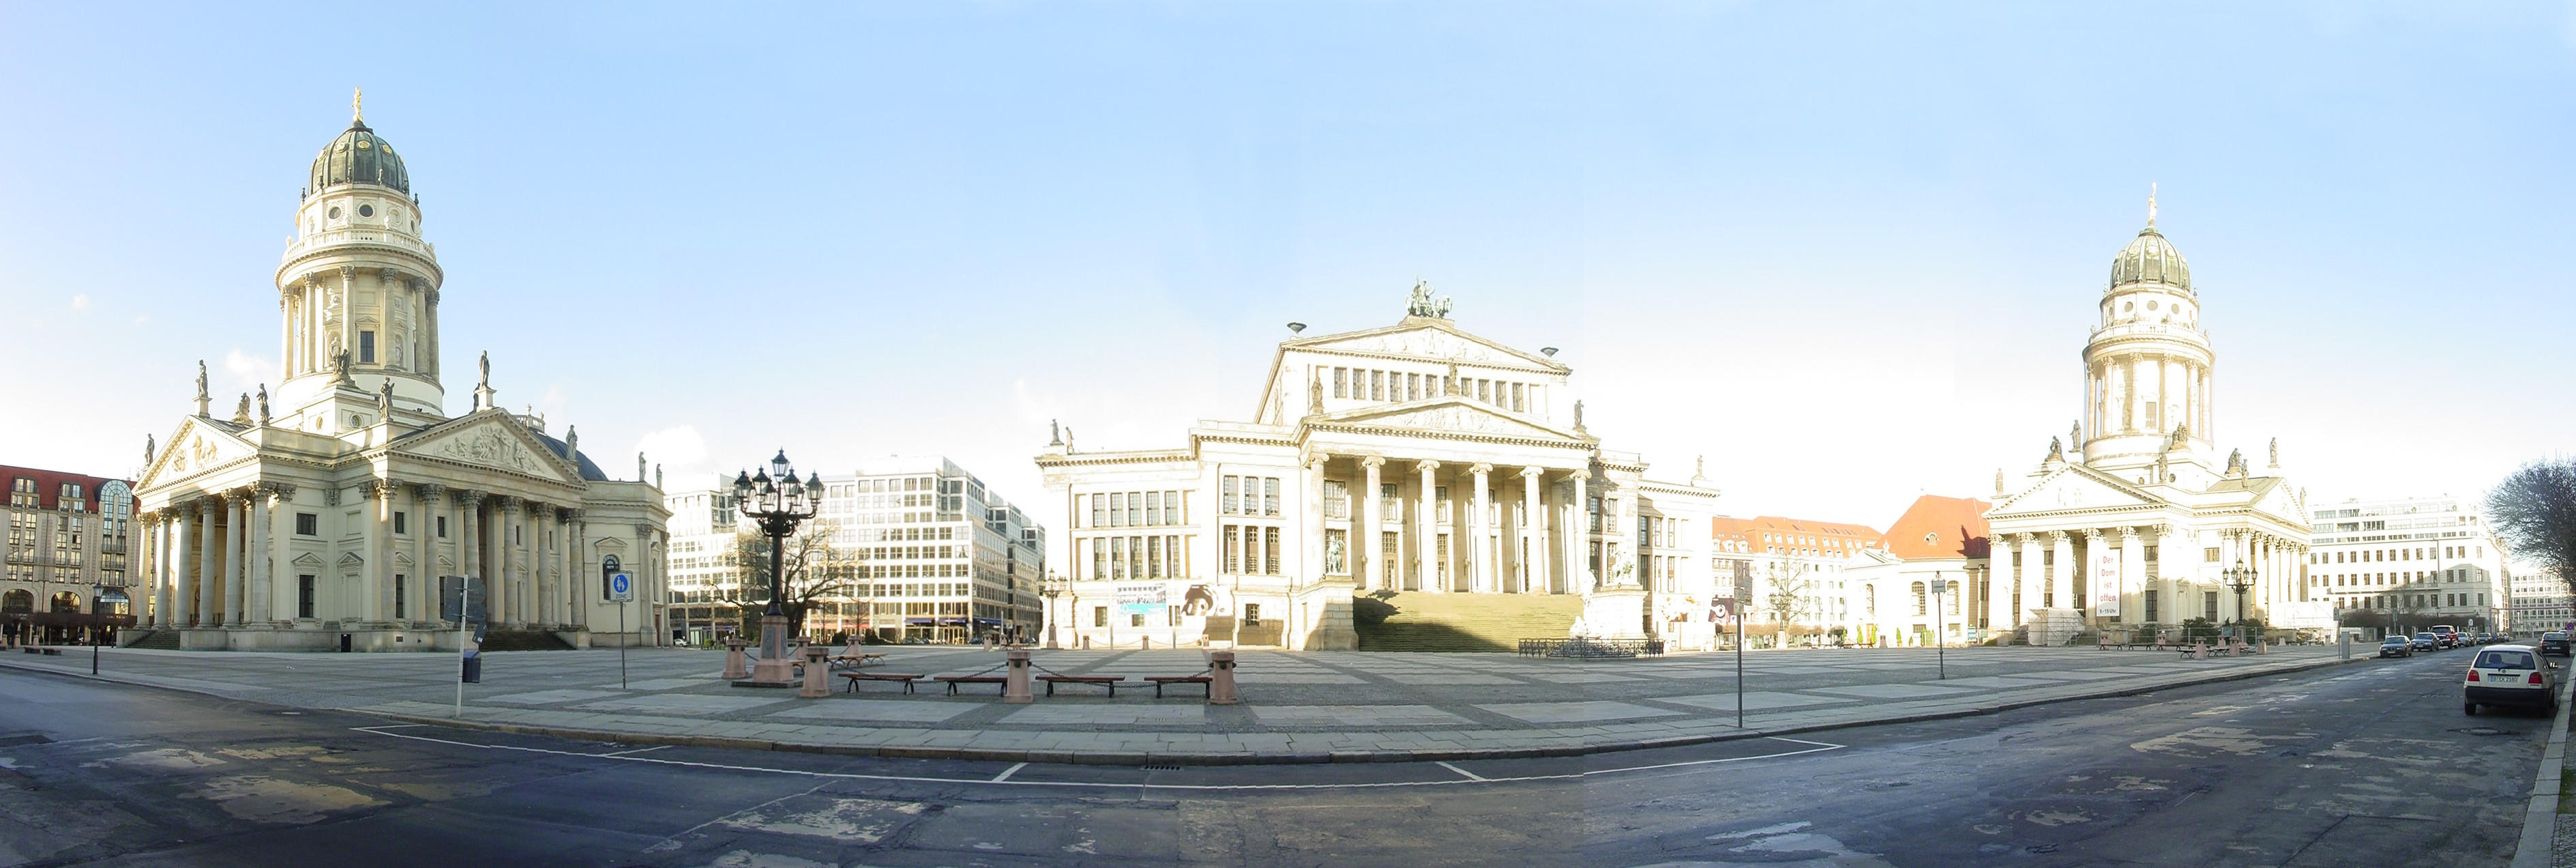 Gendarmenmarkt by arcanjel